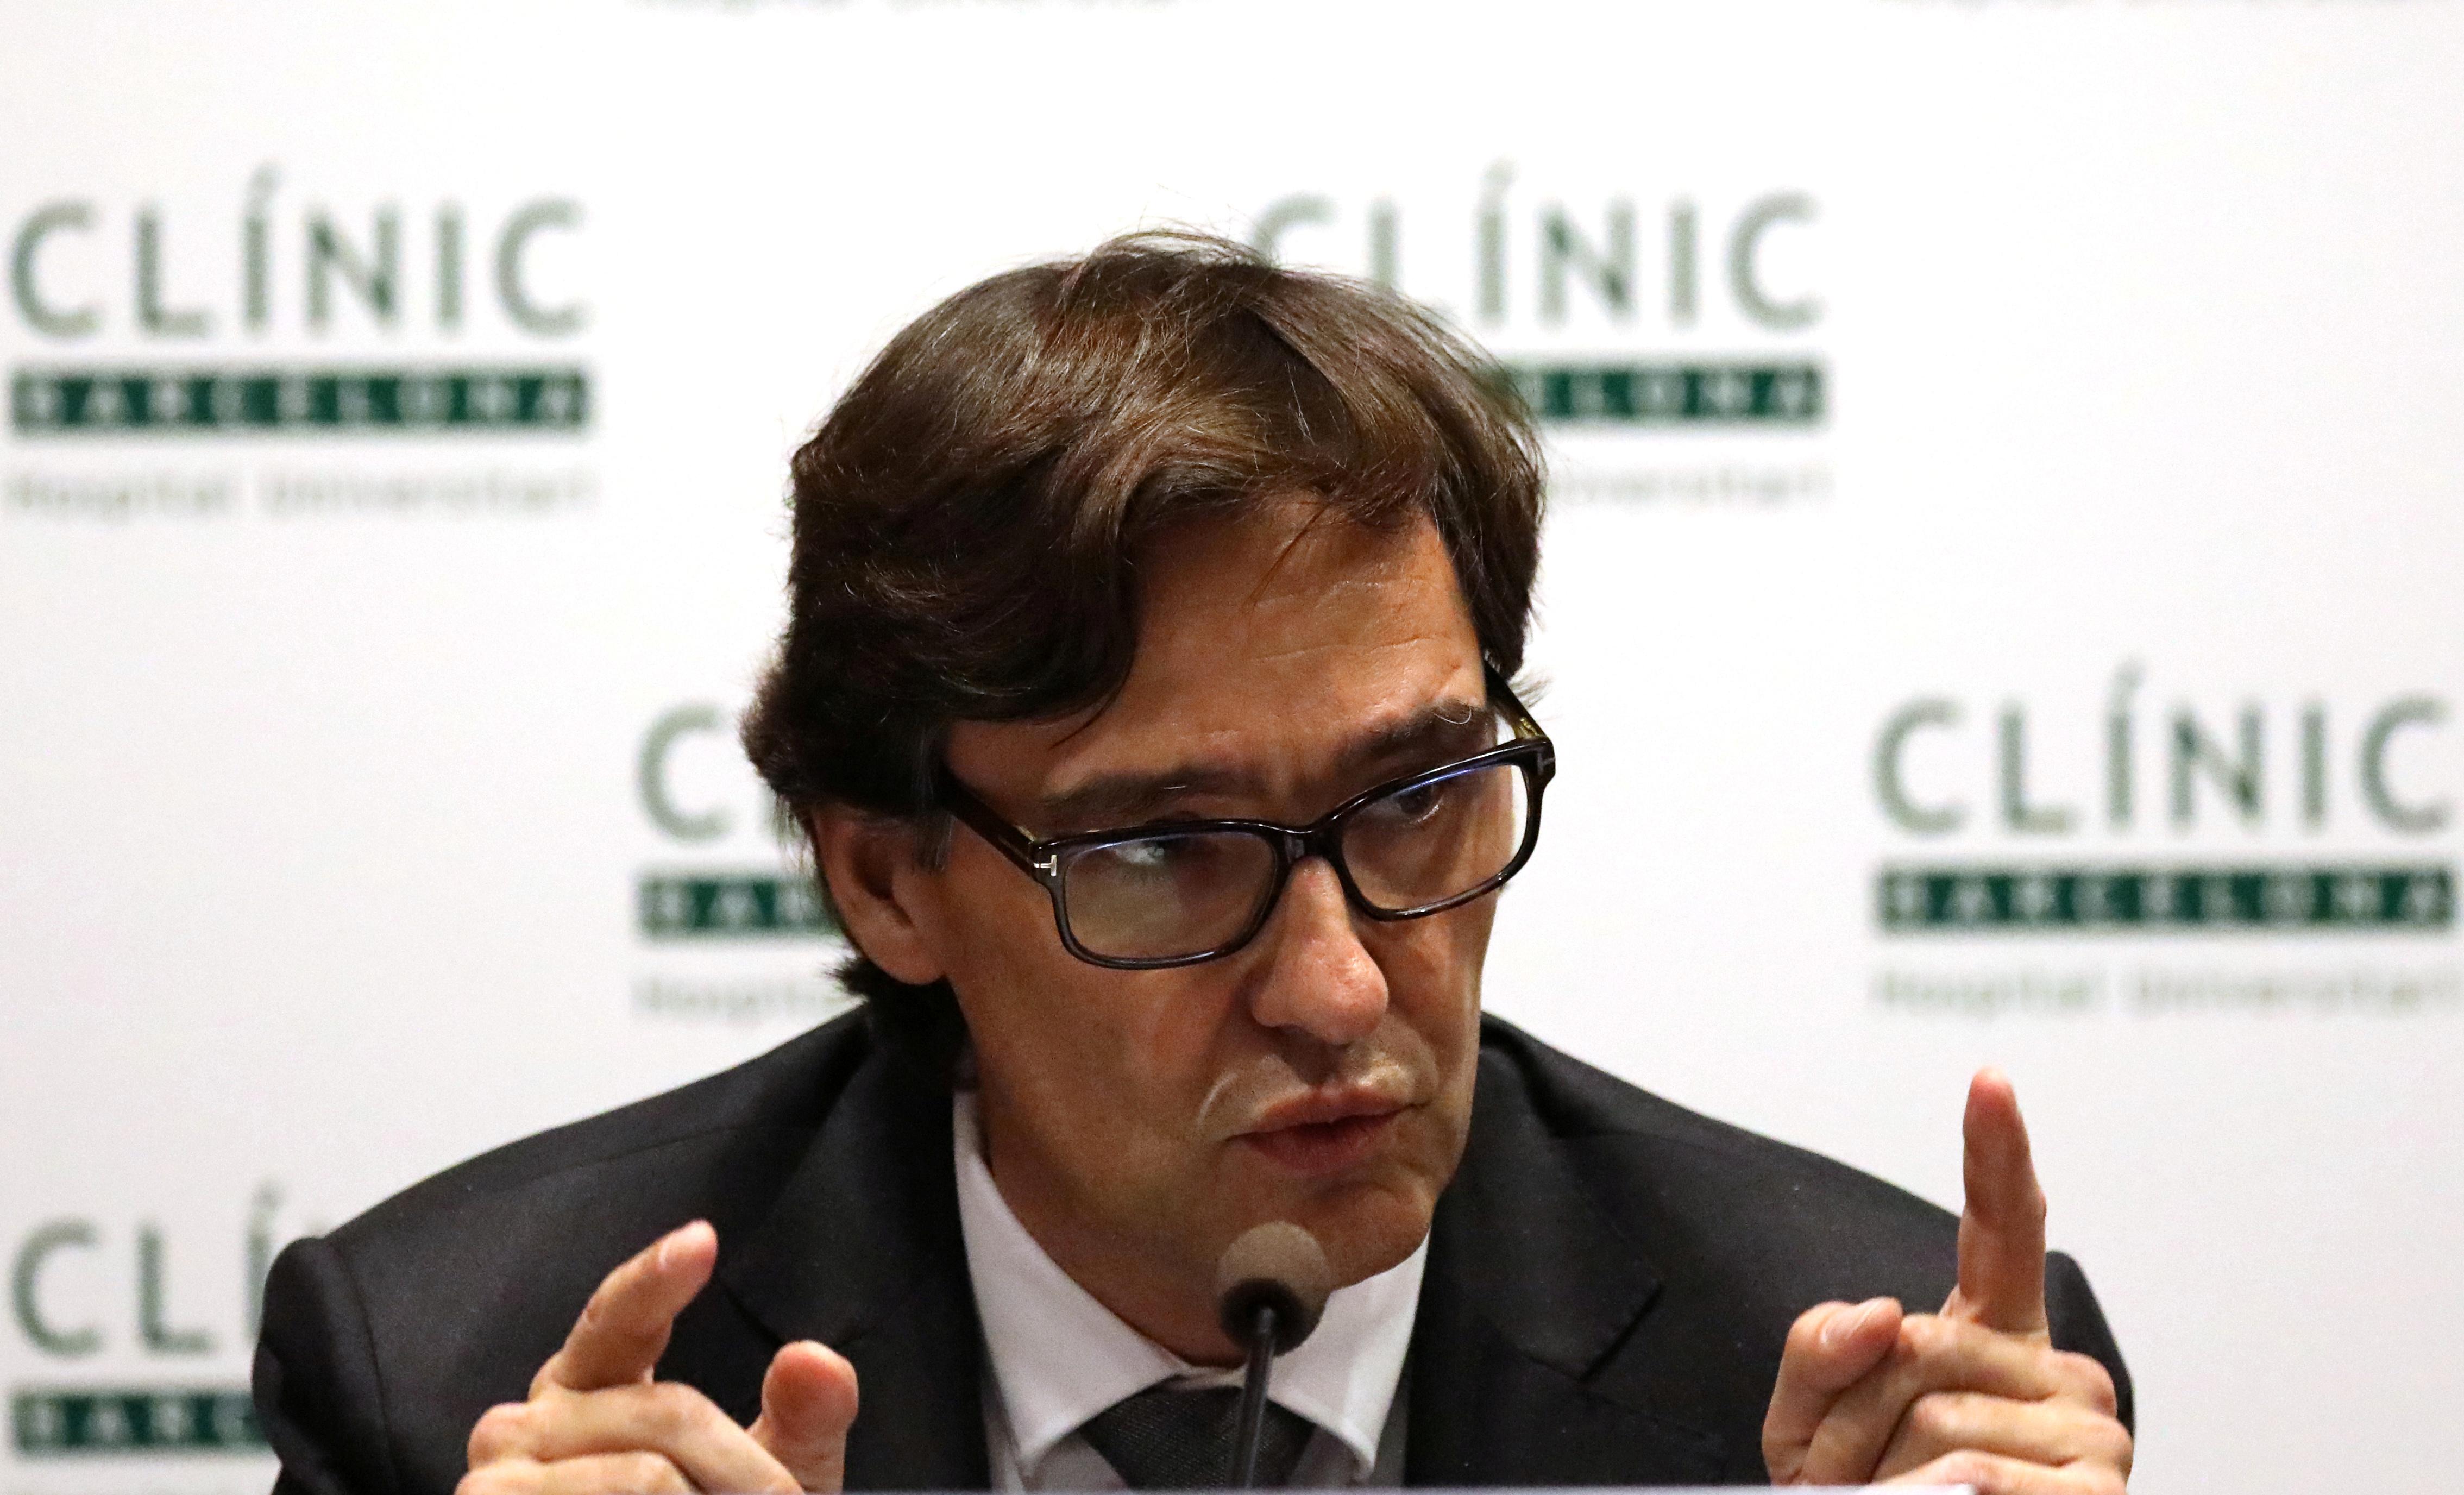 Spain's Health Minister Salvador Illa in Barcelona, Spain February 12, 2020. REUTERS/Nacho Doce/File Photo